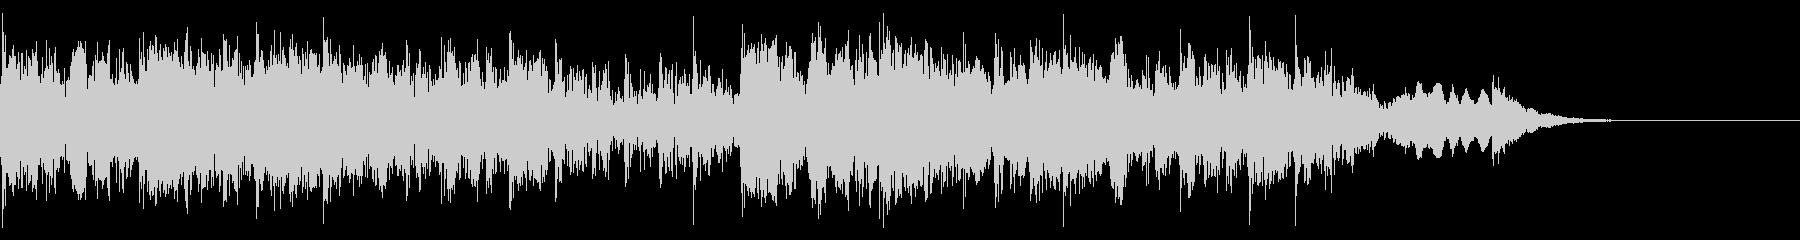 YouTube尺八による和風ジングル06の未再生の波形